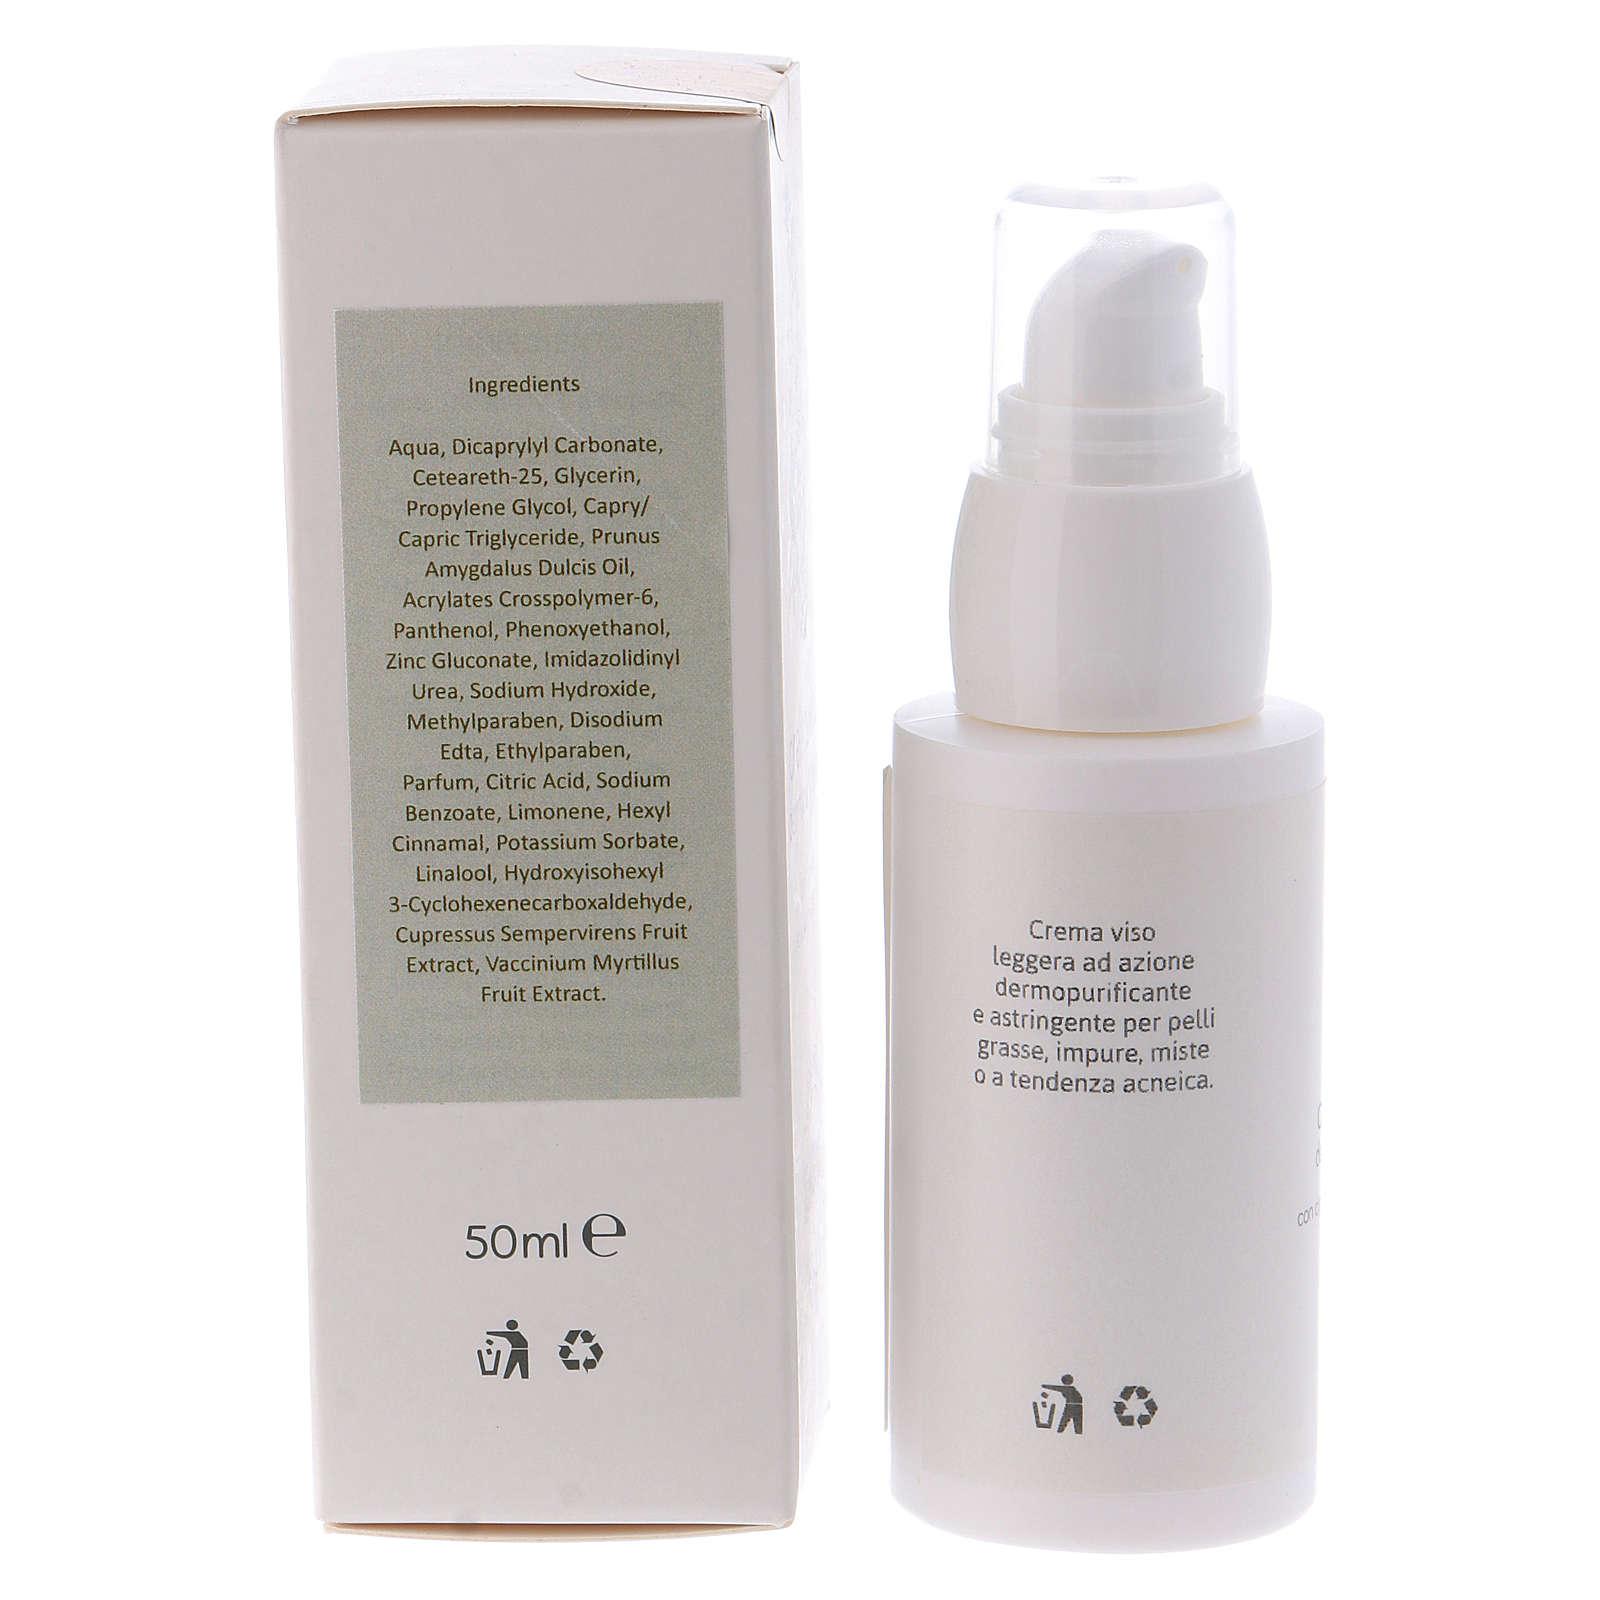 Crème visage dermopurifiante, 50 ml Valserena 4